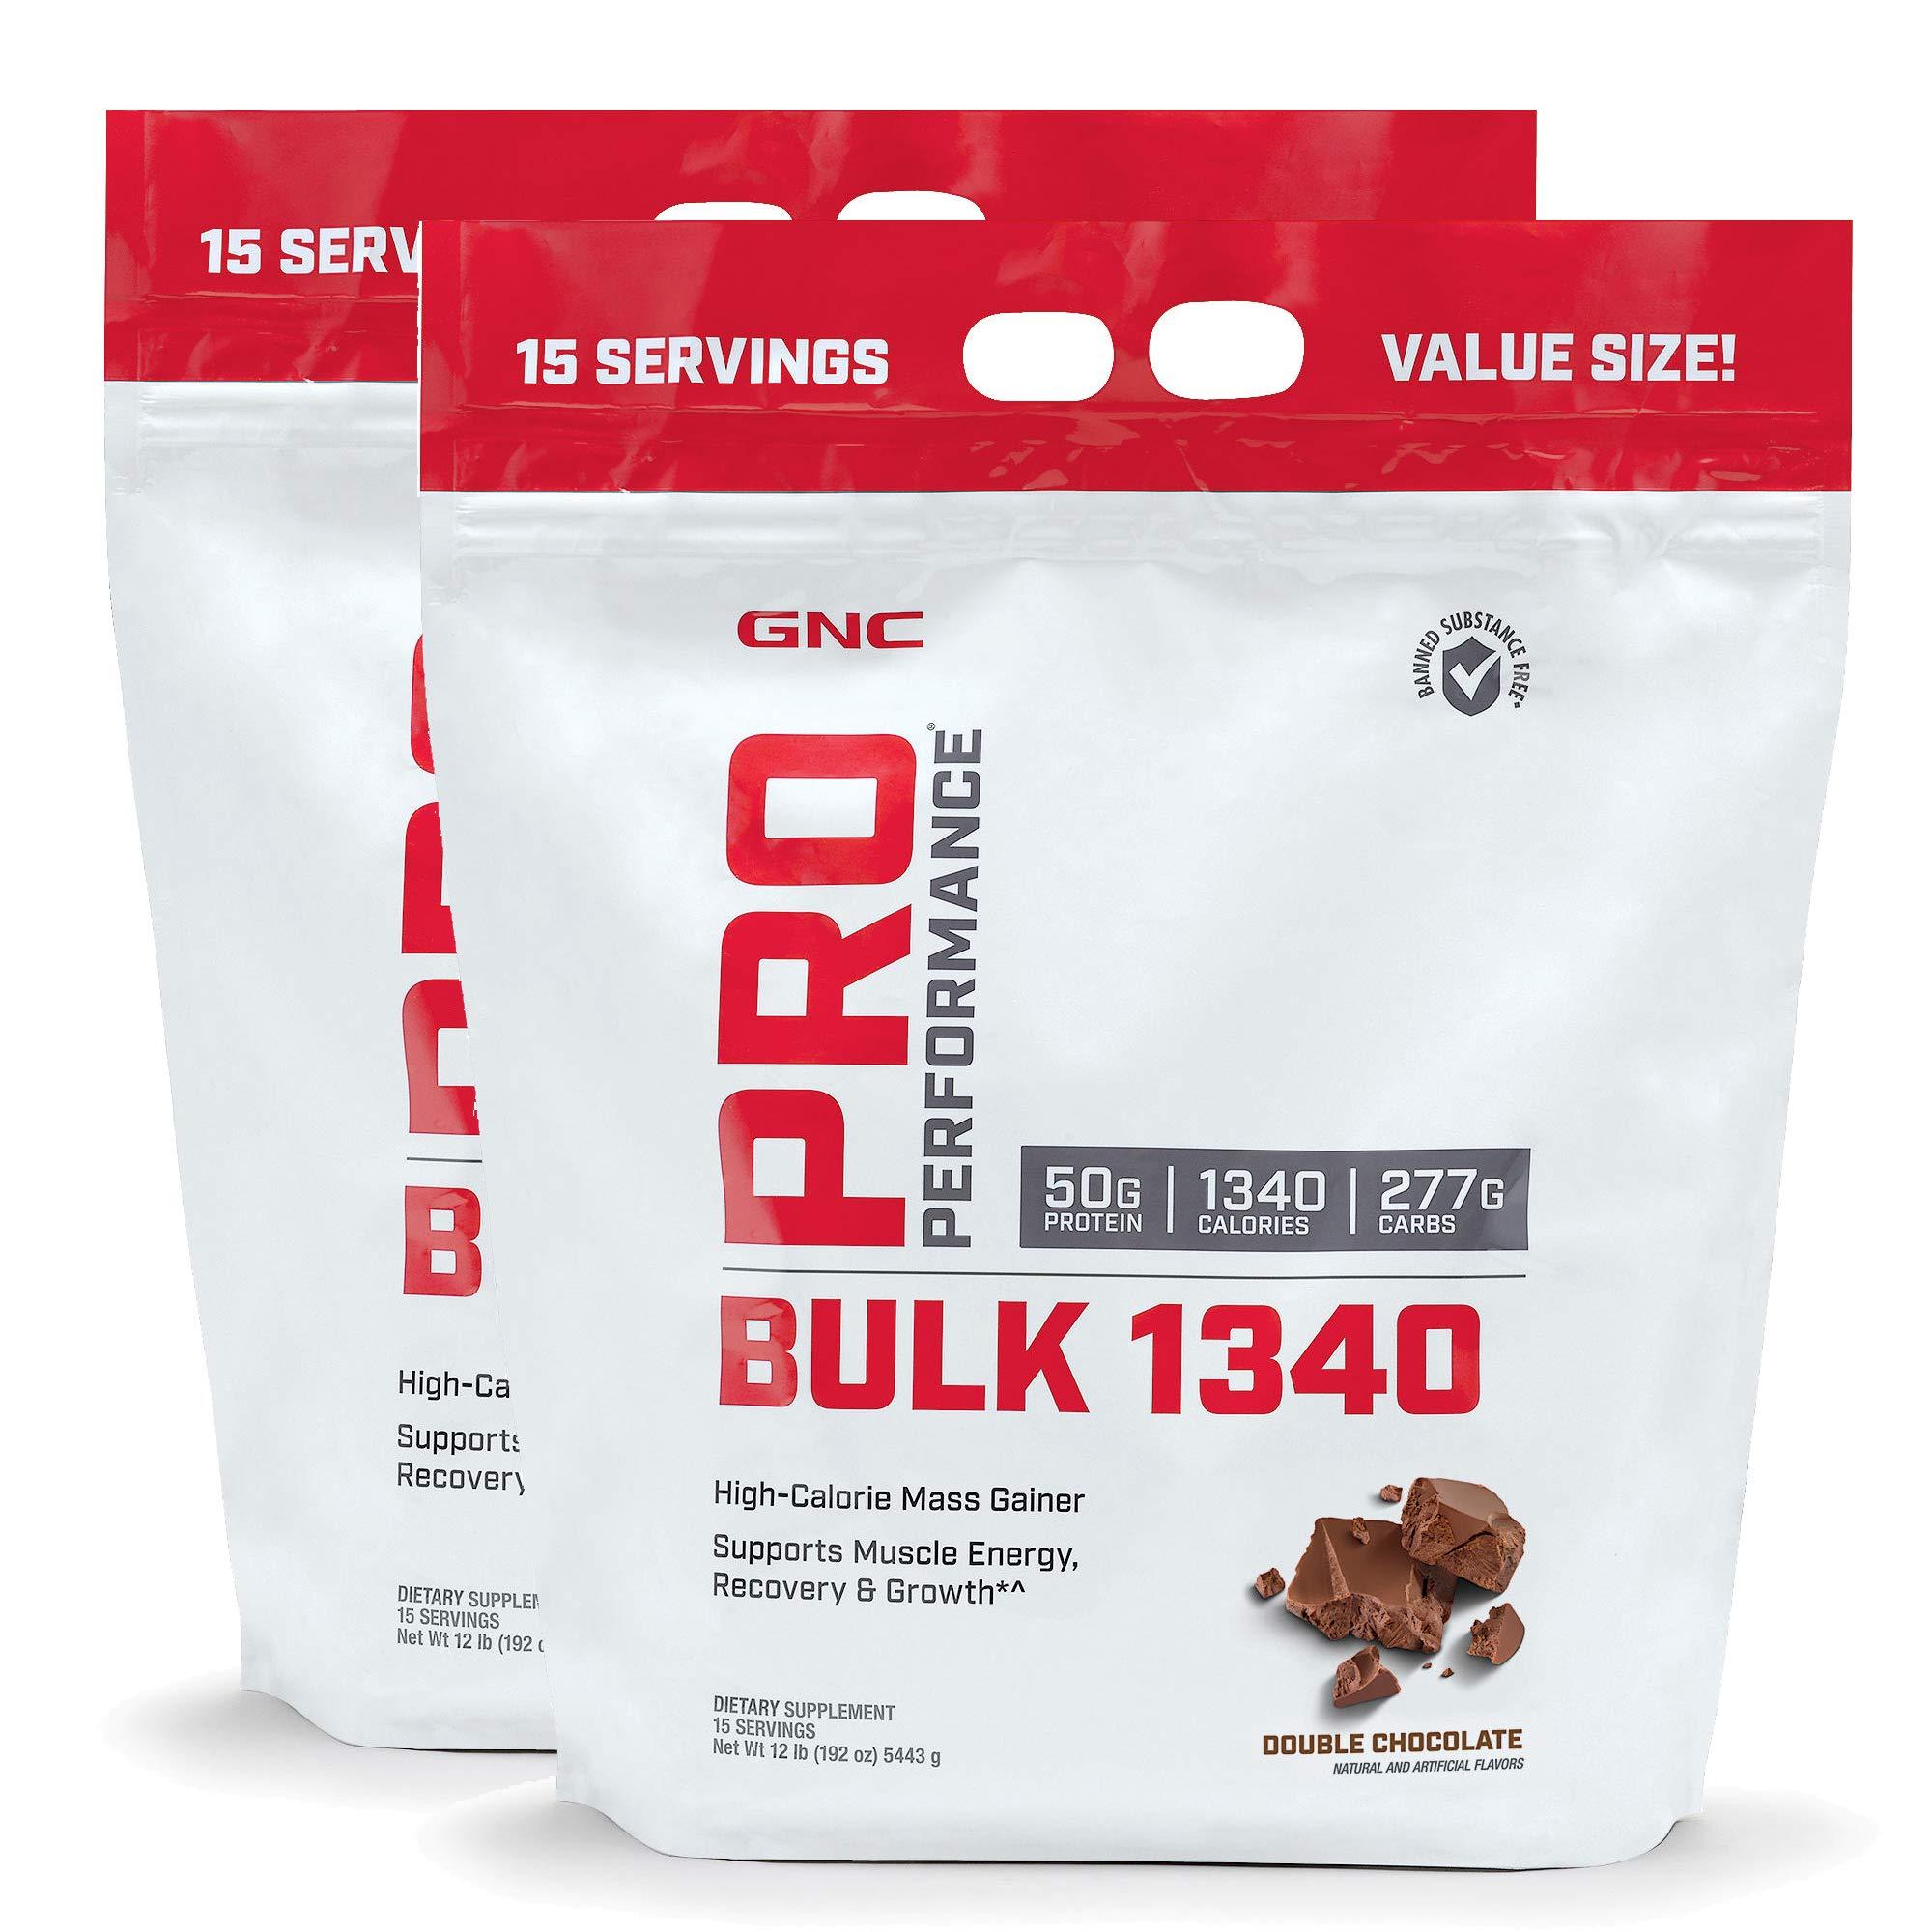 GNC Pro Performance Bulk 1340 - Double Chocolate - Twin Pack